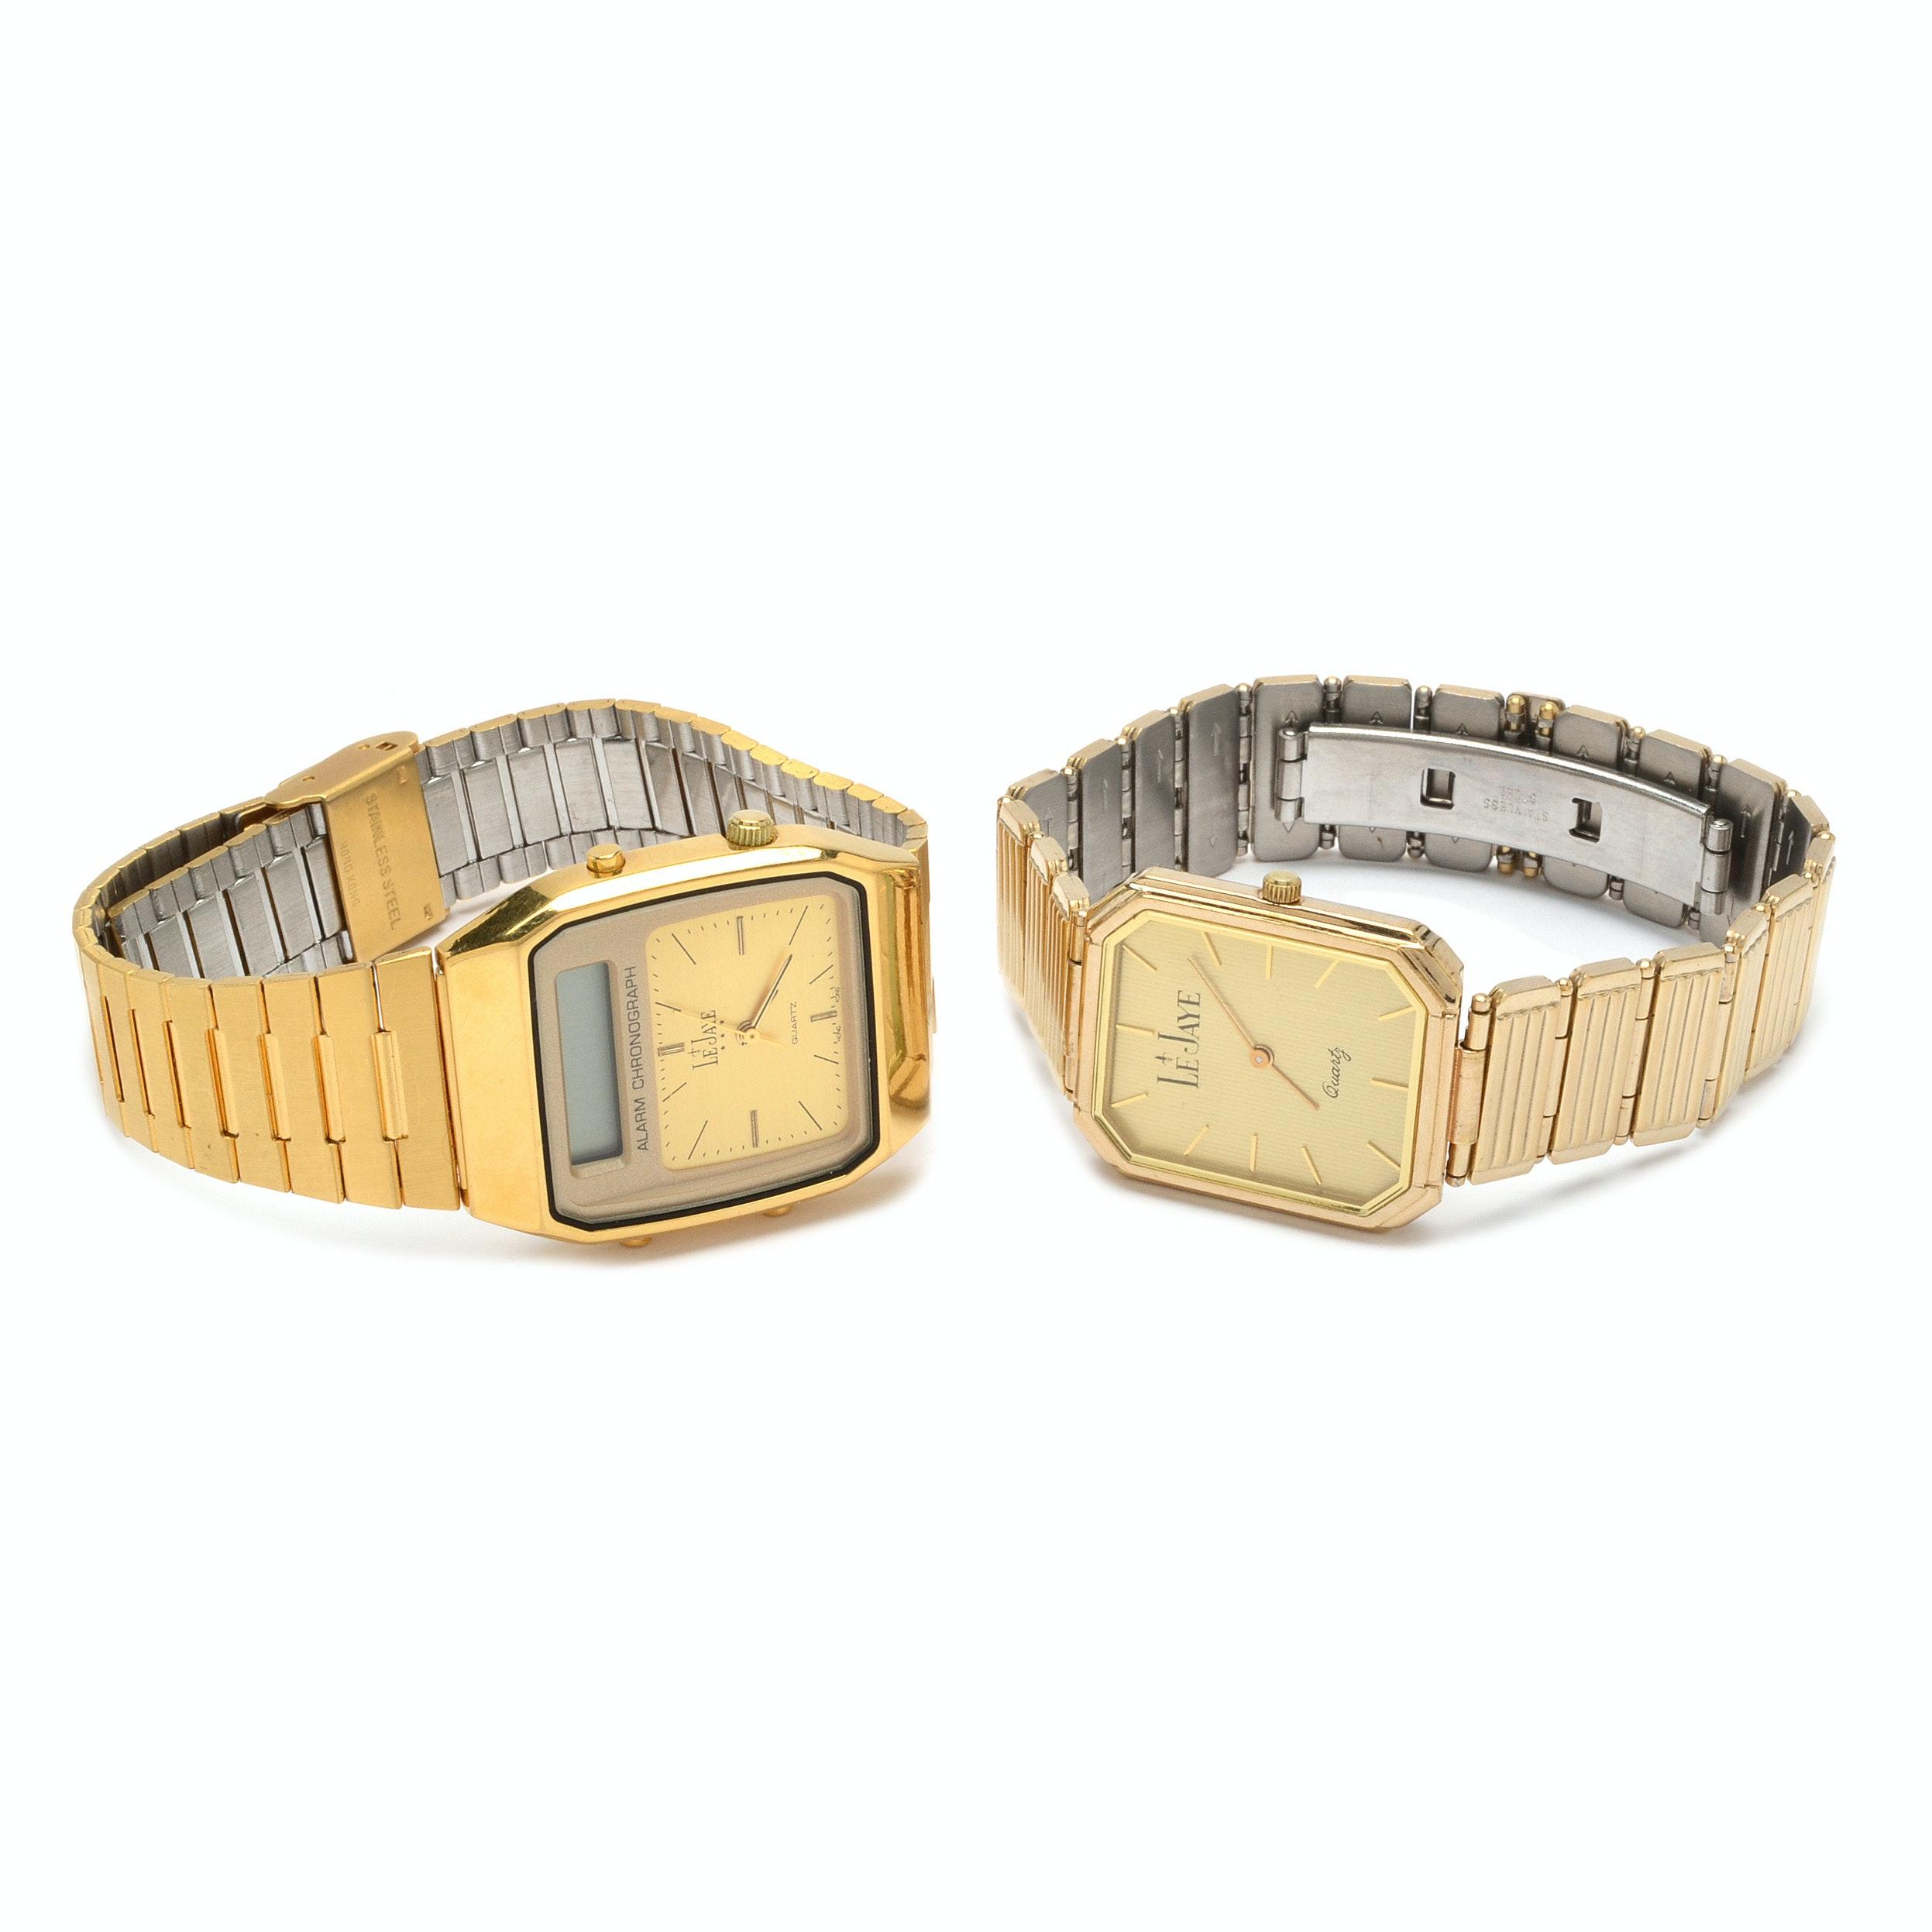 Vintage Le Jaye Wristwatches